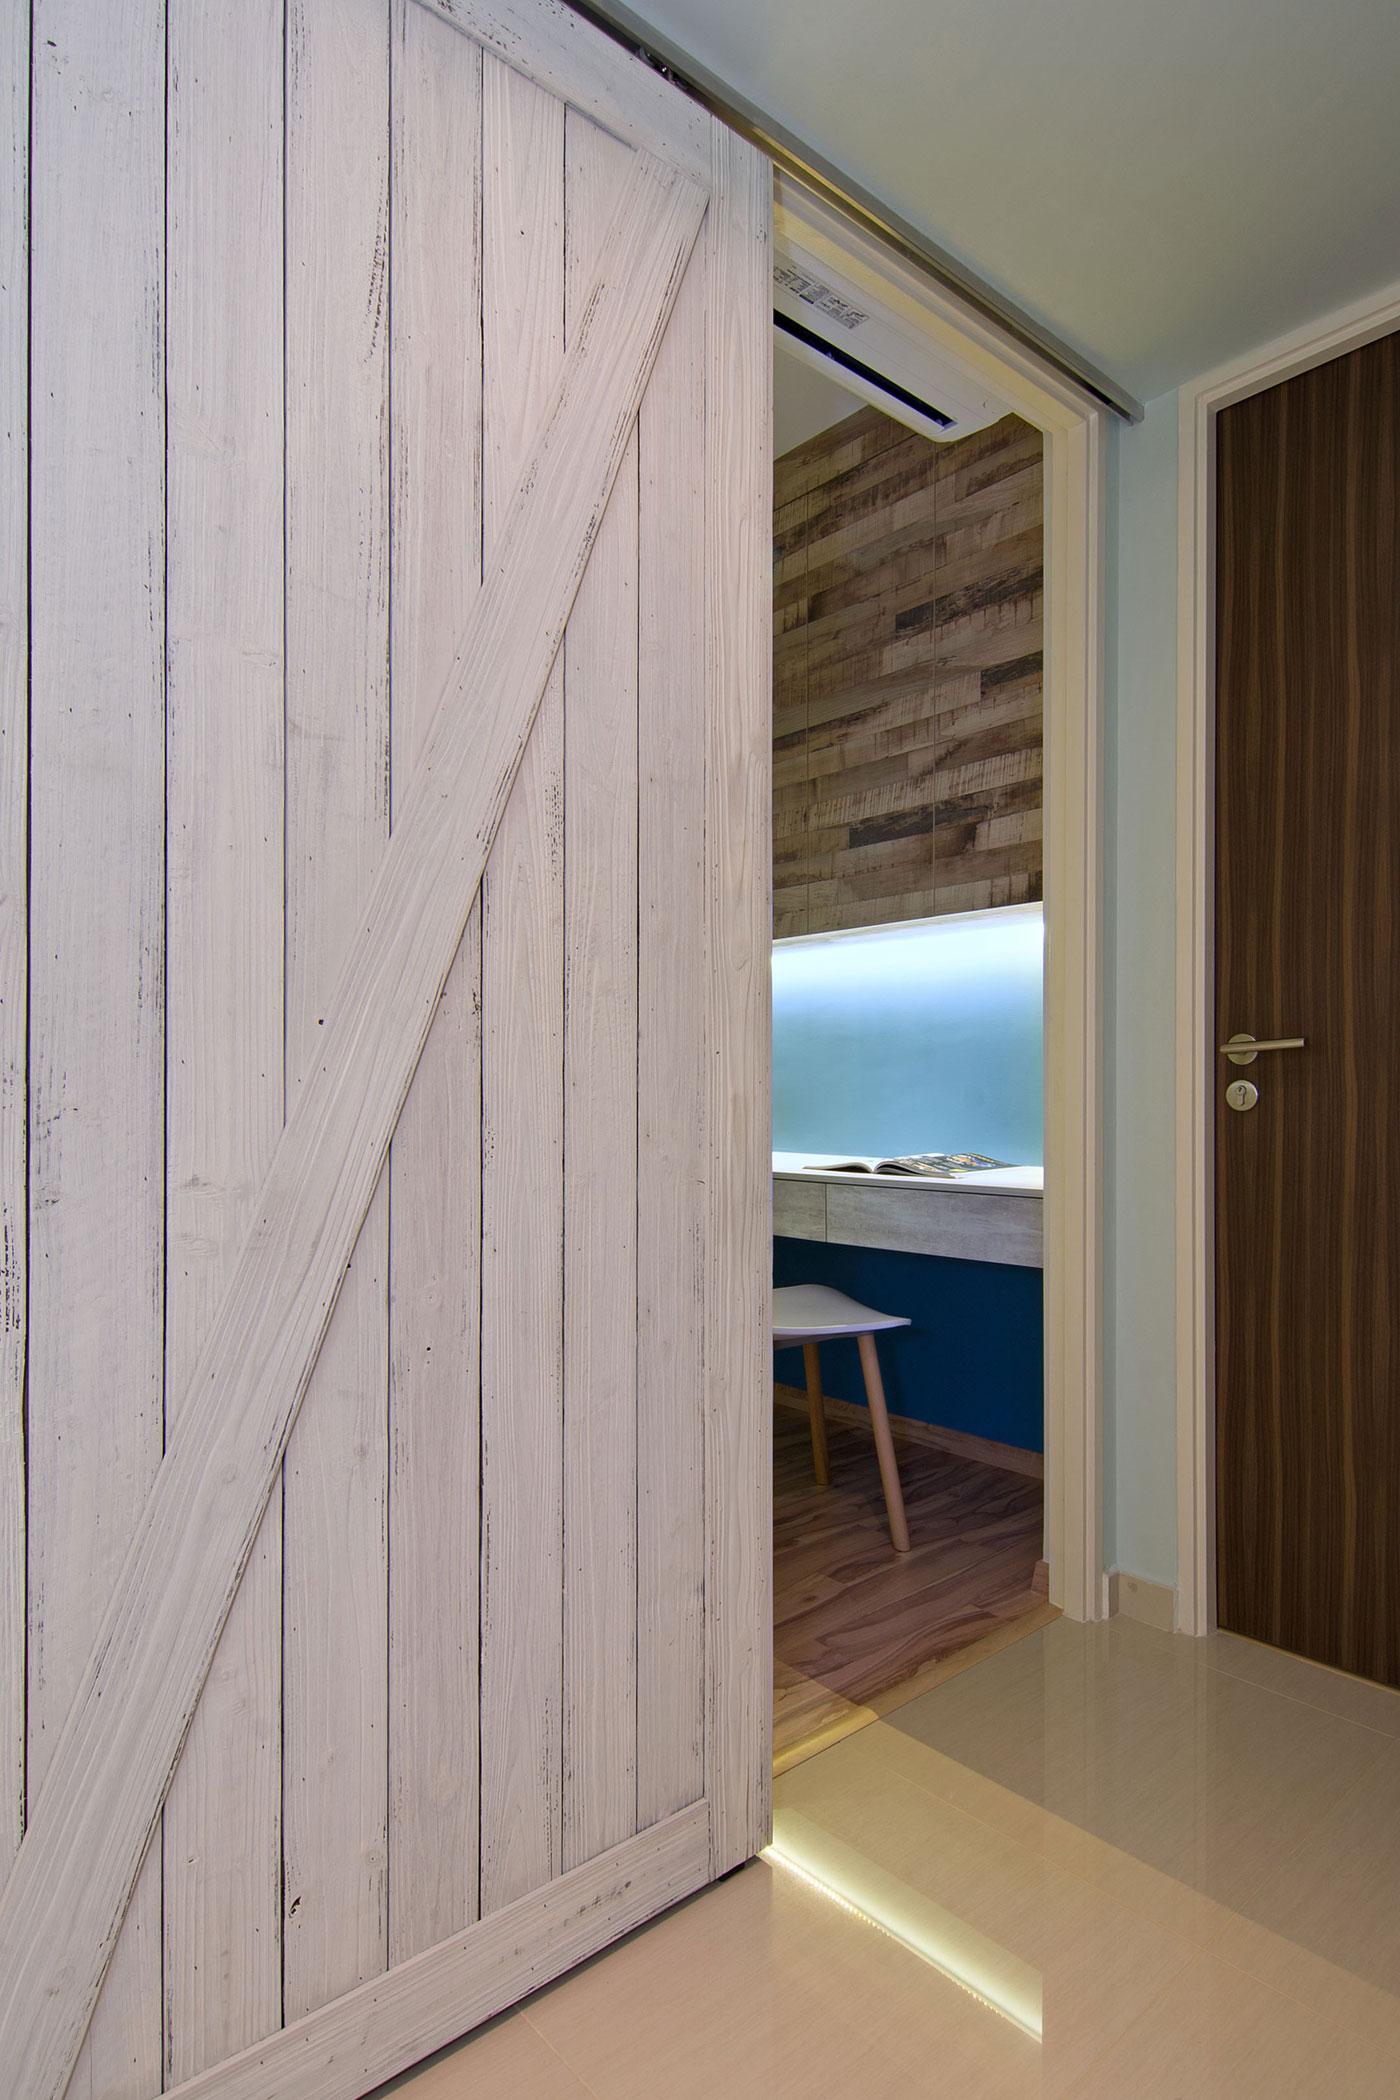 Beach house urban apartment in Singapore by Vievva Designers-14